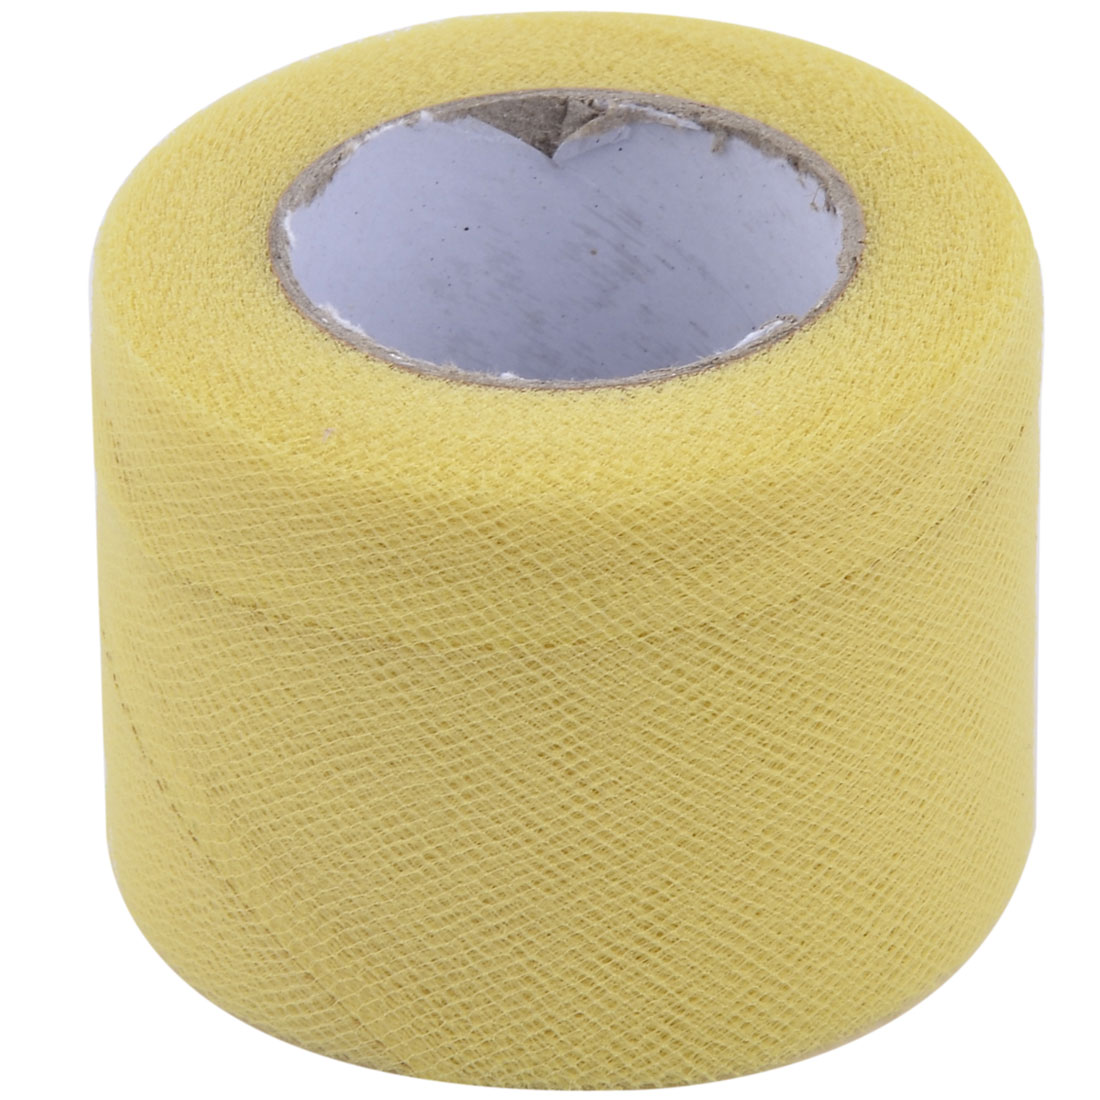 Wedding Feast Polyester Tutu Gift Handicraft Tulle Spool Roll Khaki 2 Inch x 25 Yards